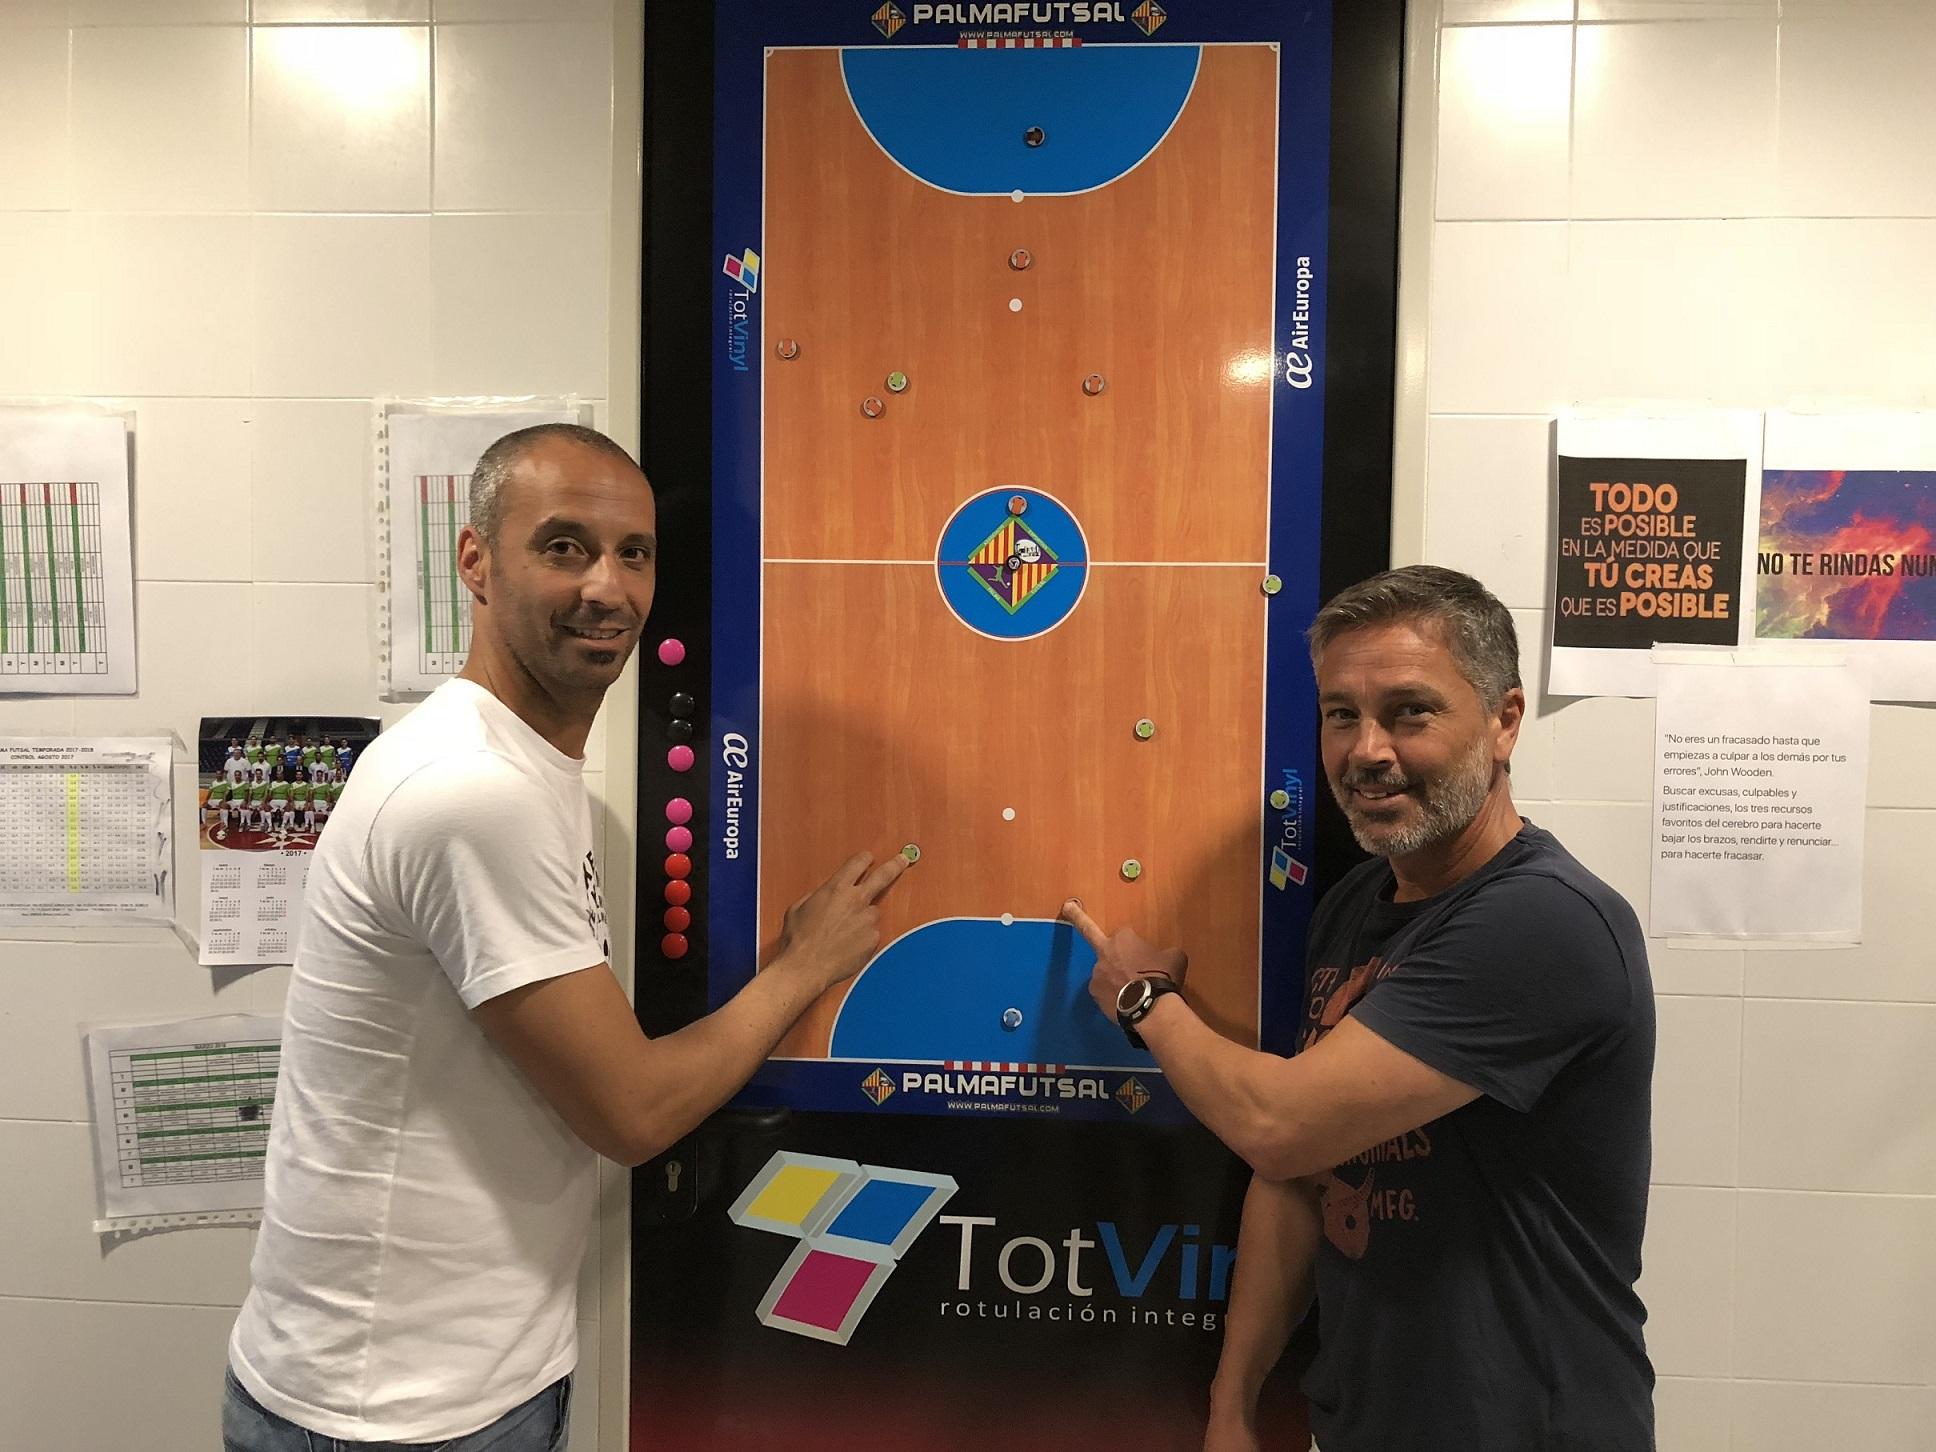 web Antonio Vadillo y Juan Pedro Ortega posan en el vestuario 2